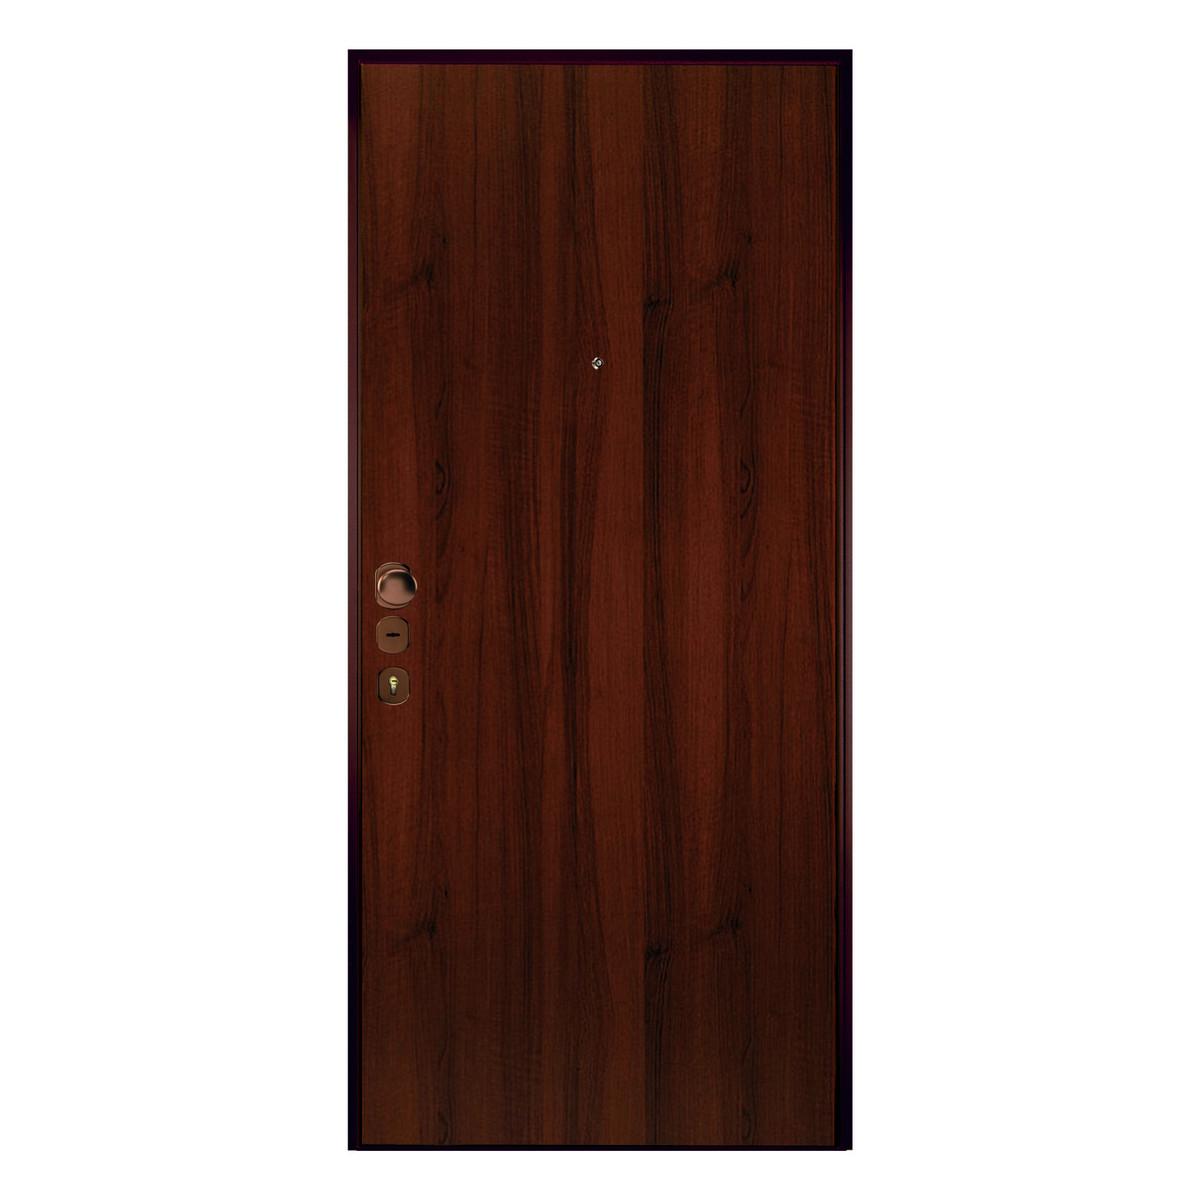 Porta blindata double key noce l 80 x h 210 cm sx prezzi for Erba sintetica prezzi leroy merlin